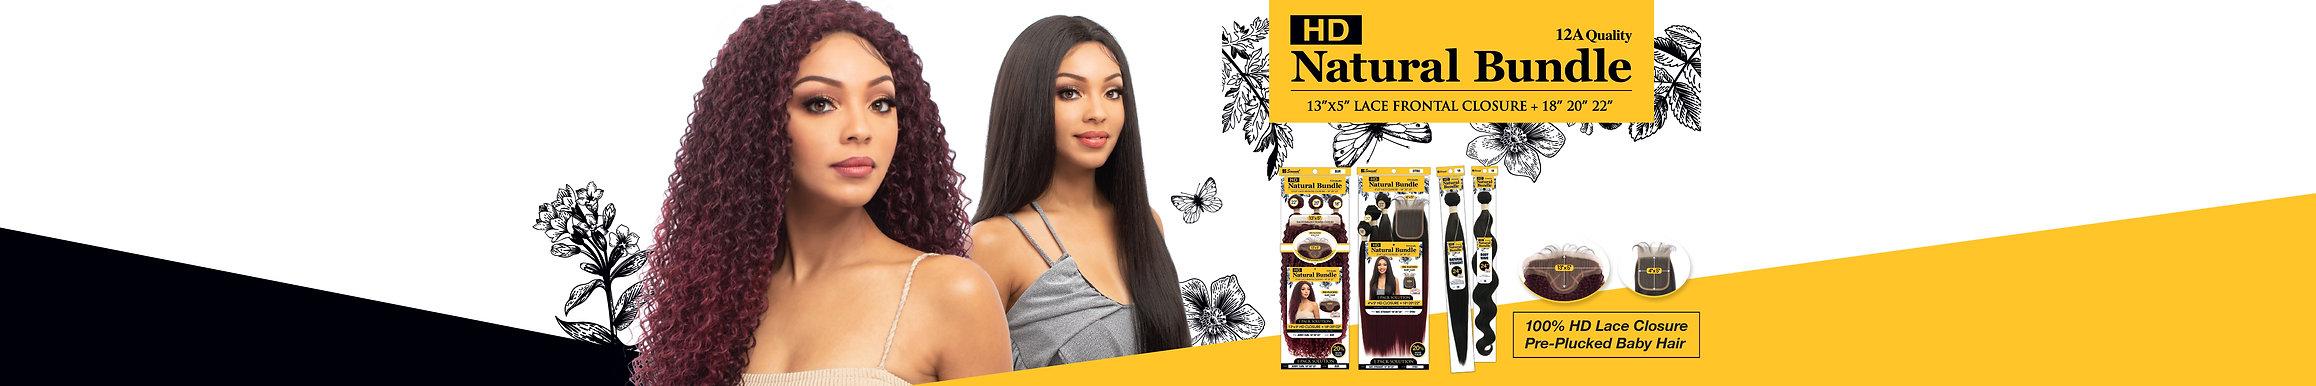 HD Natural Bundle copy.jpg